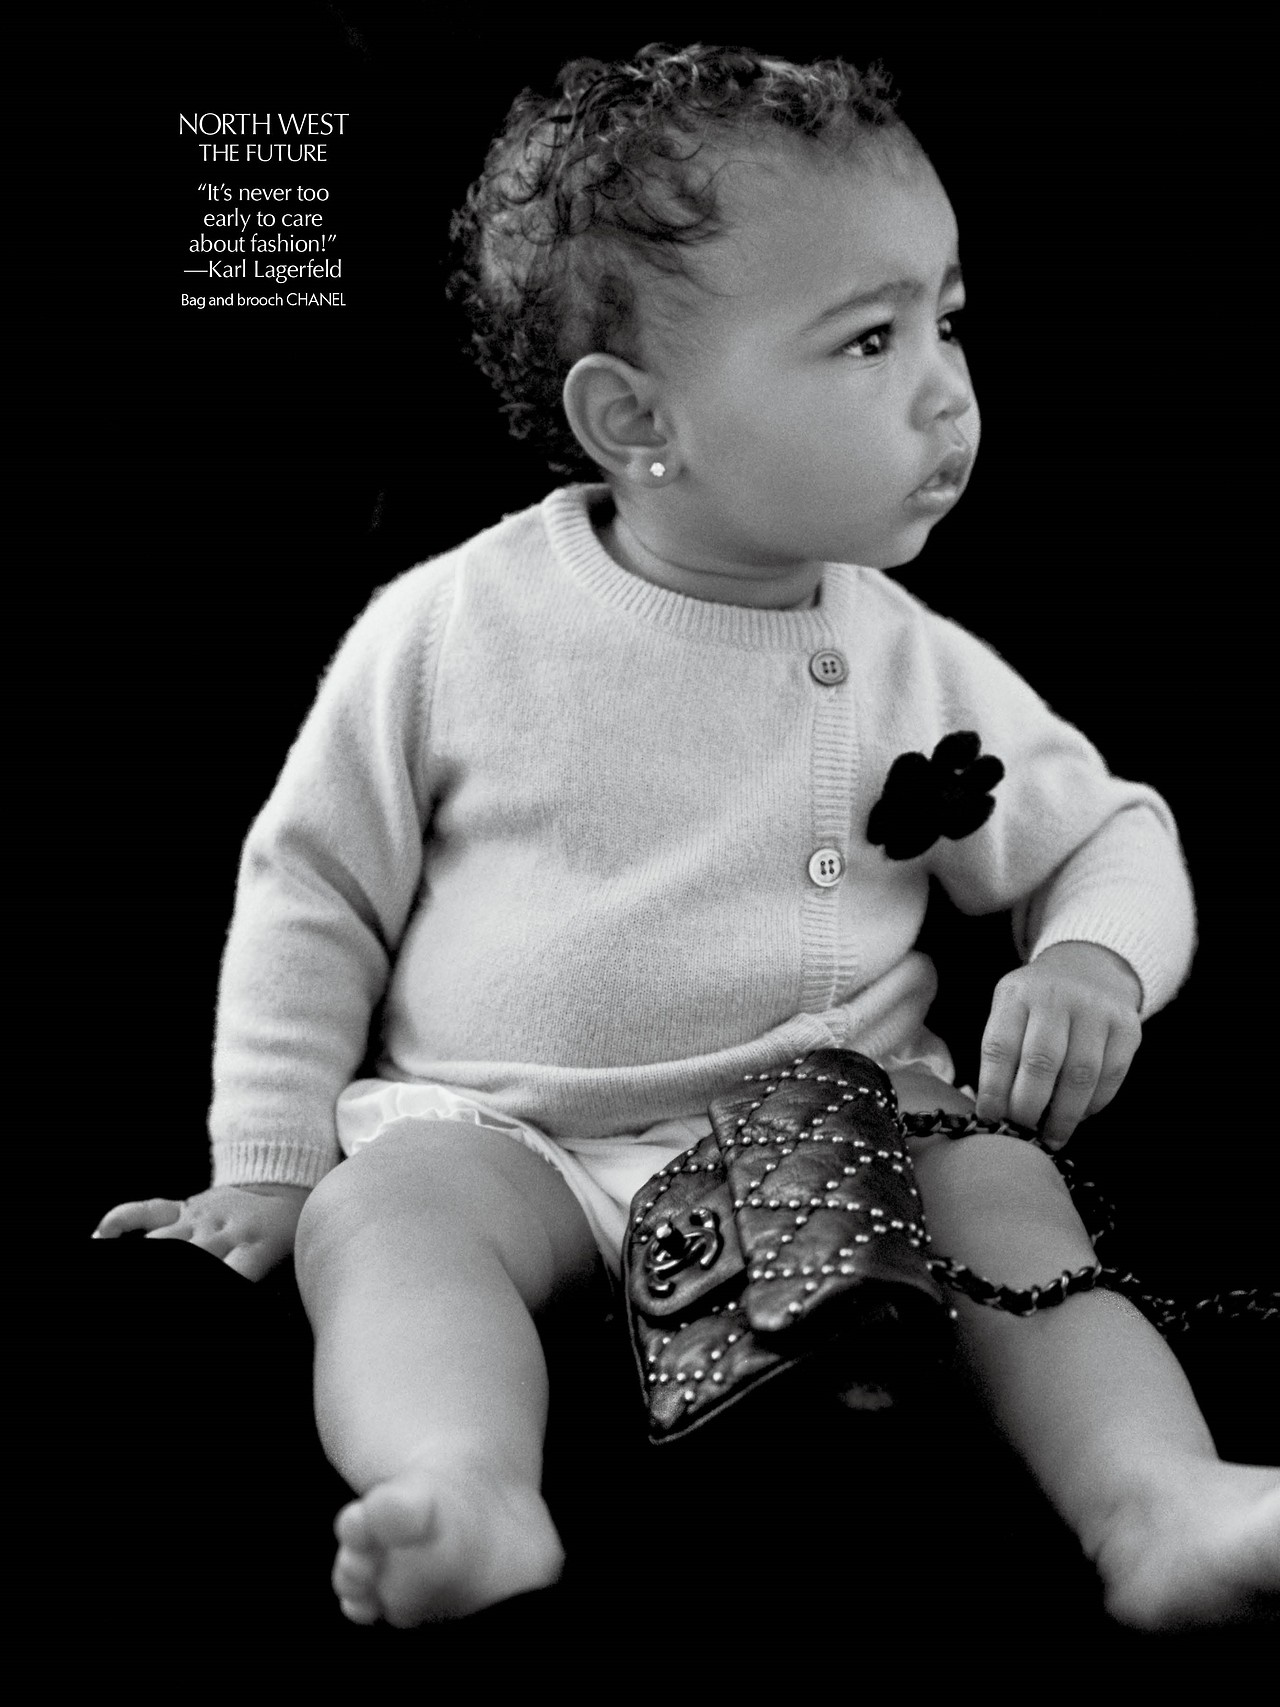 Image via CR Fashion Book.